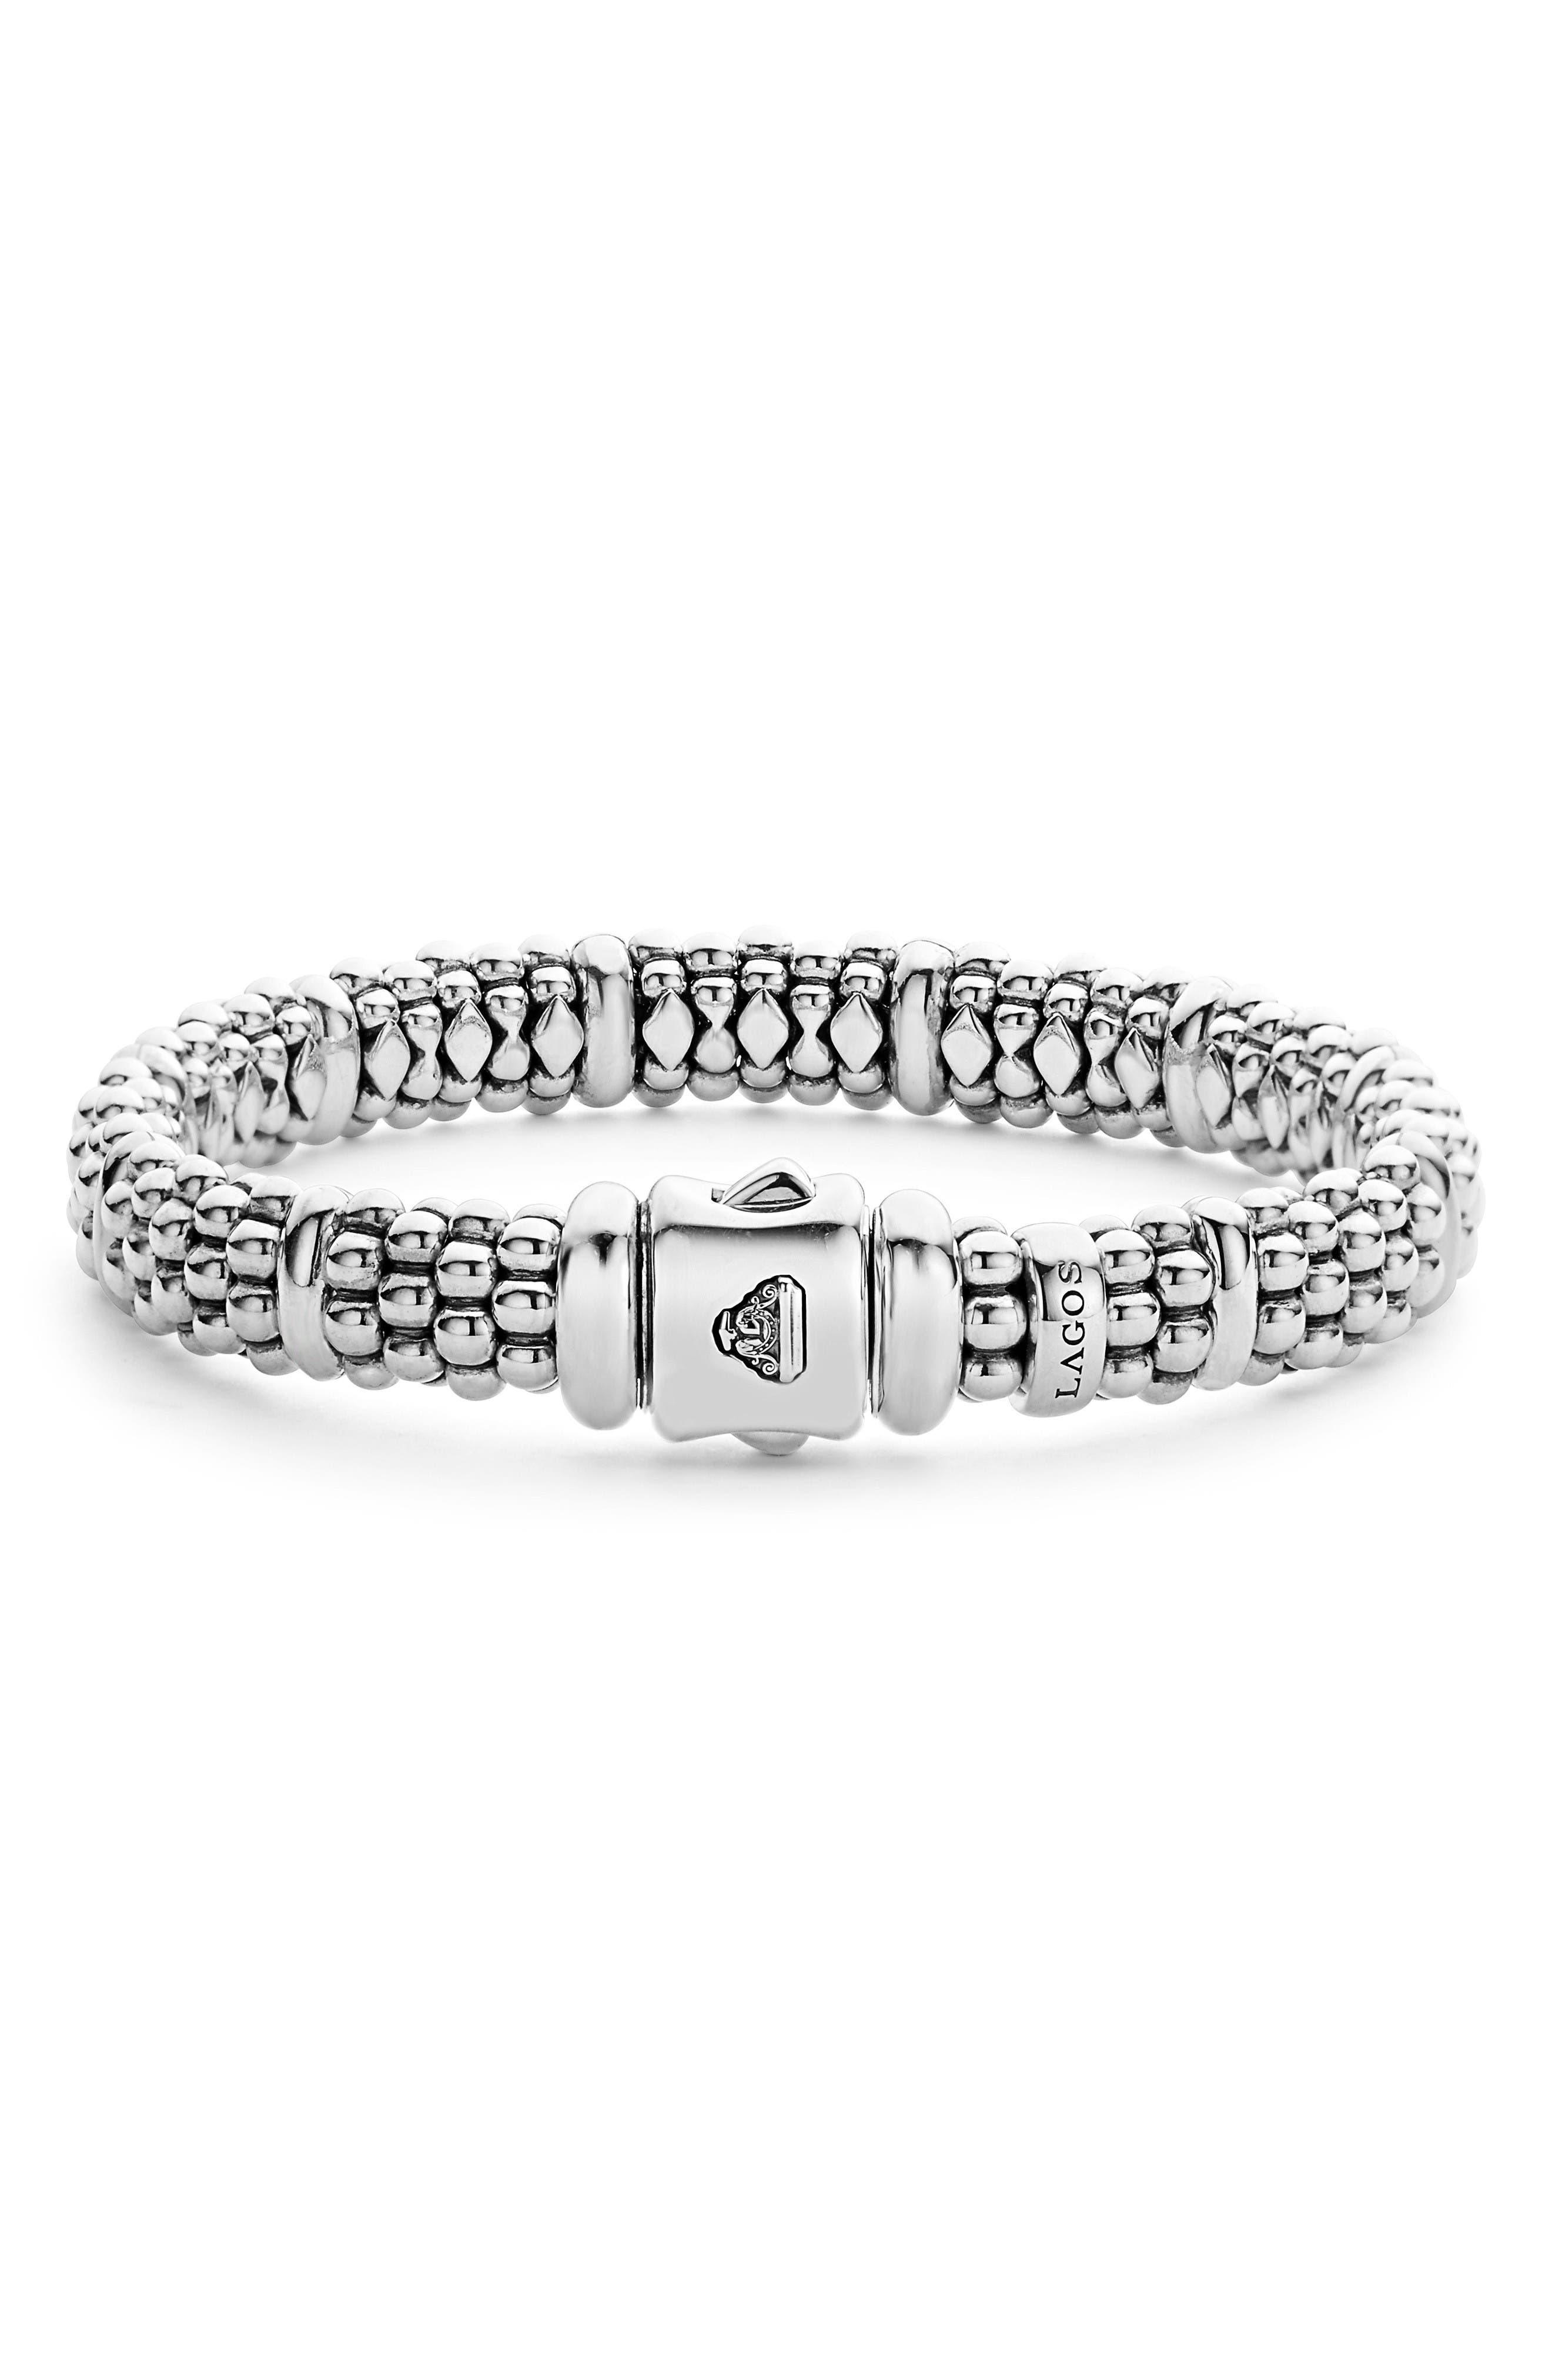 Oval Rope Caviar Bracelet,                             Alternate thumbnail 3, color,                             Silver